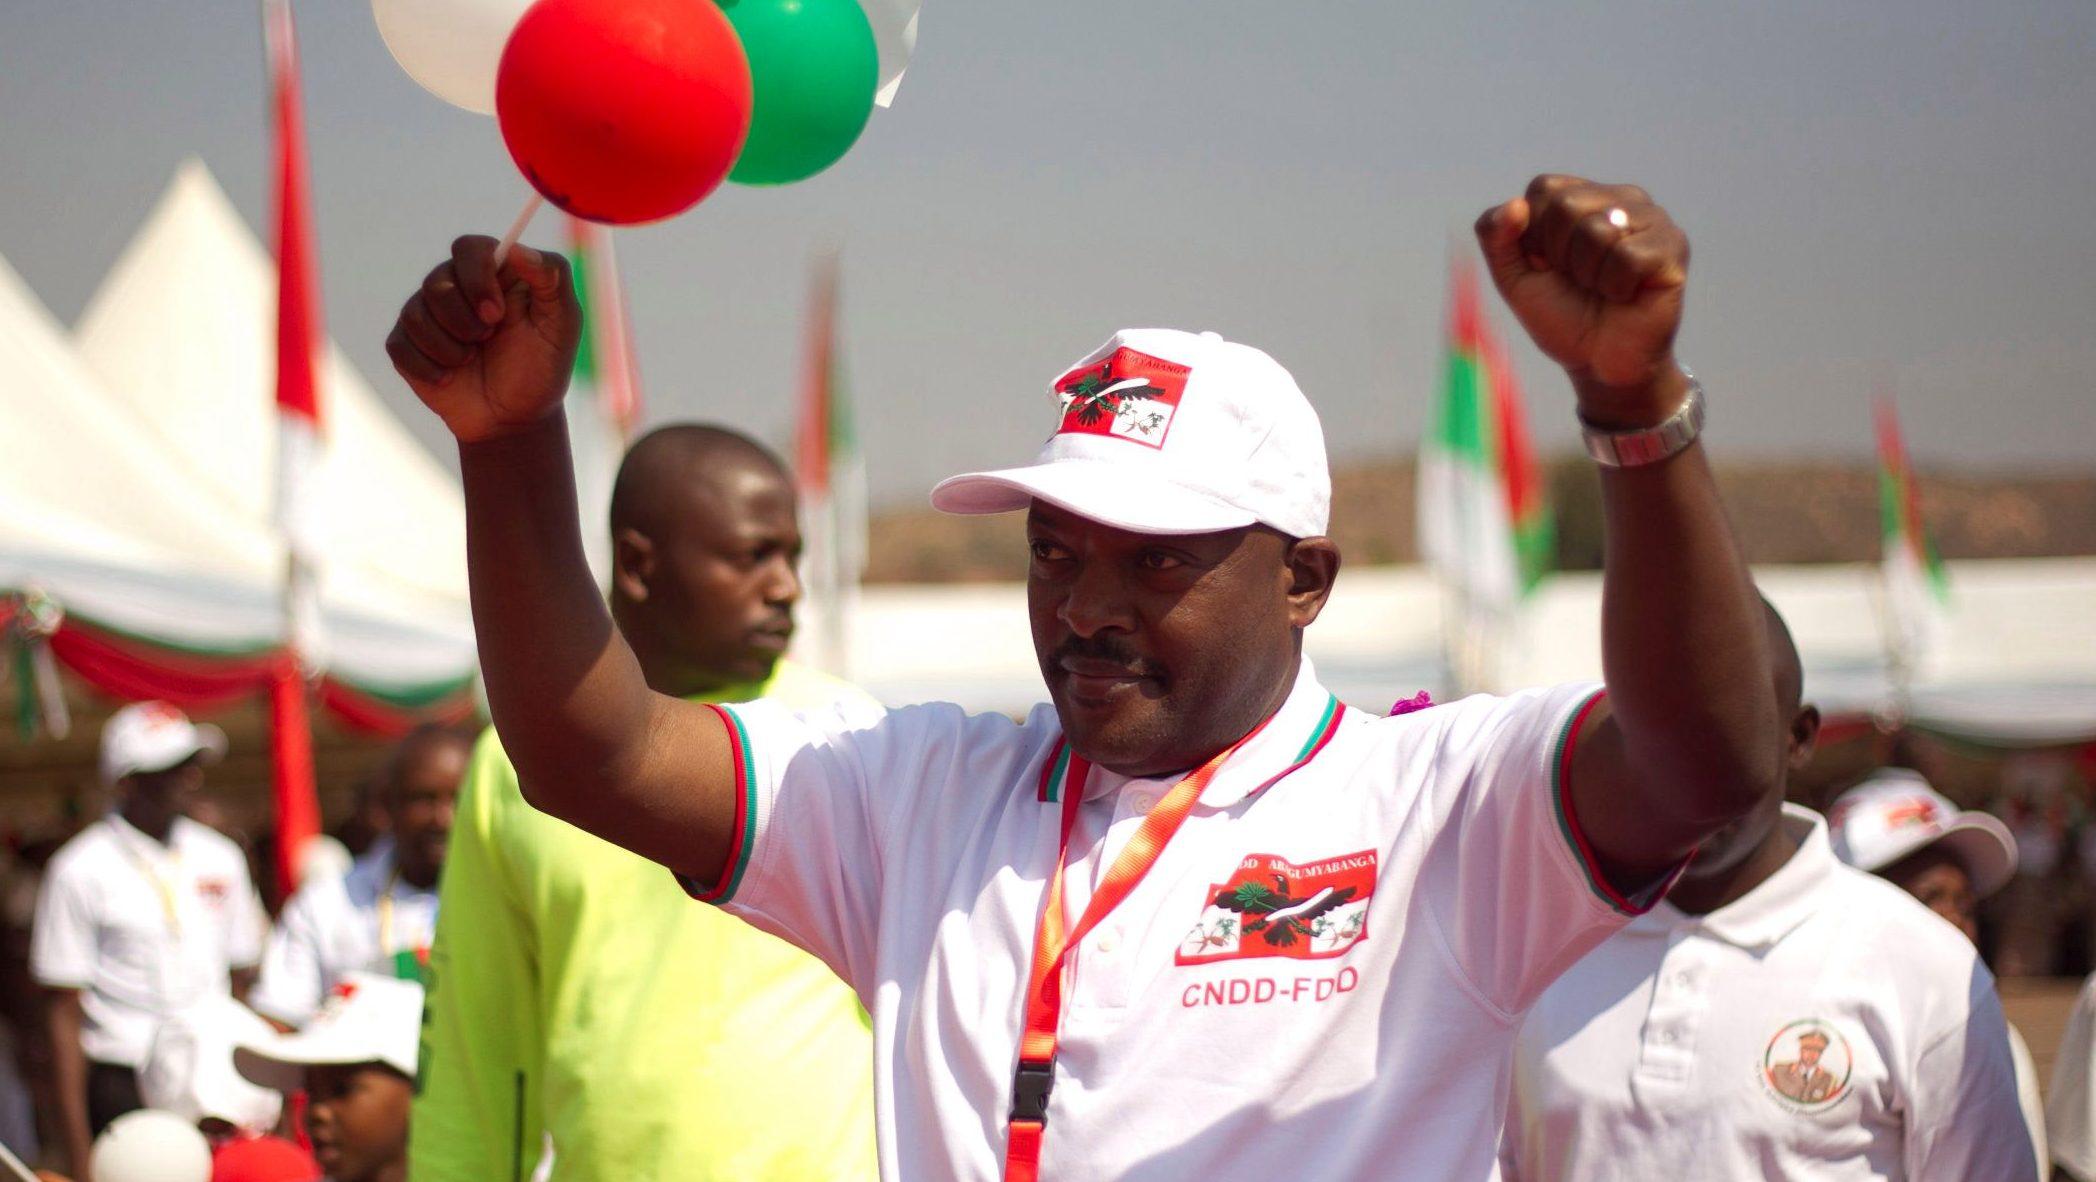 Burundi's President Pierre Nkurunziza attends the ruling Conseil National pour la Defense de la Democratie - Forces pour Defense de la Democratie (CNDD-FDD) party extraordinary congress in Gitega Province, Burundi, August 20, 2016.